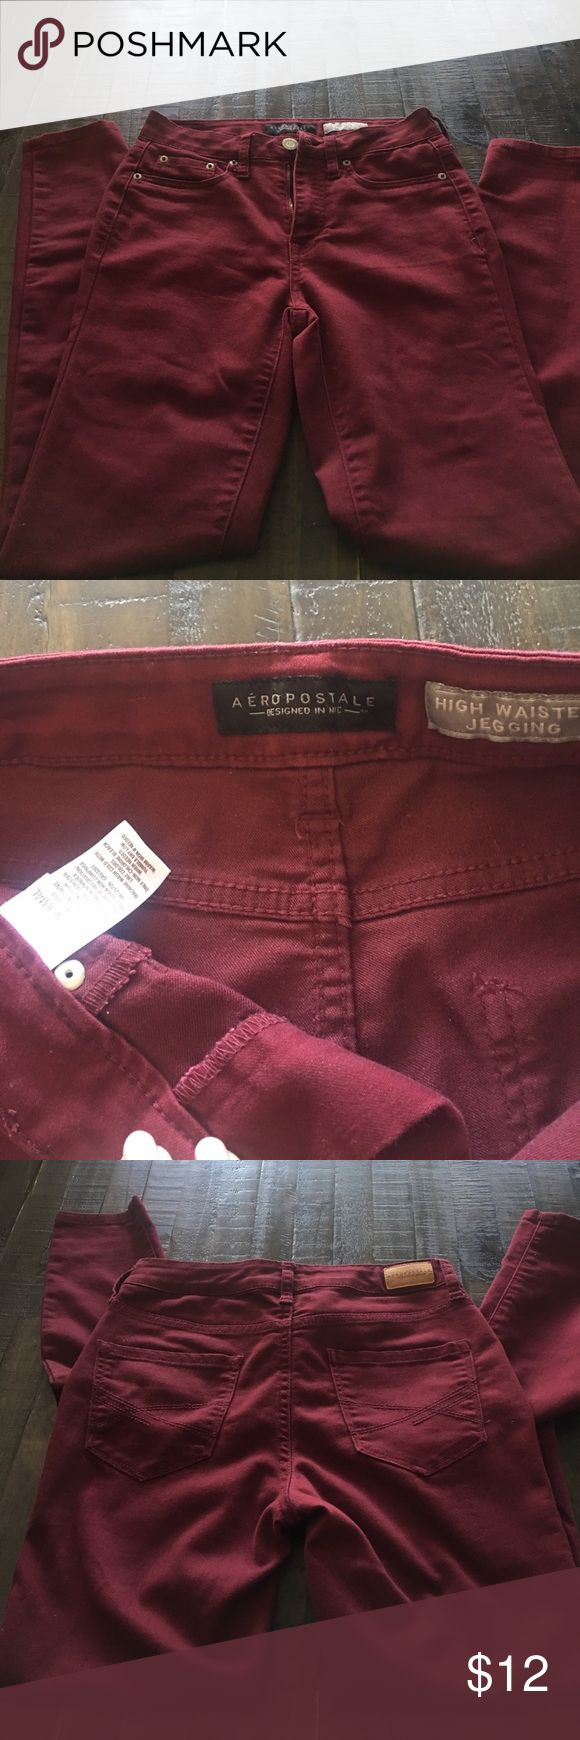 Aeropostale wine colored jeans Aeropostale skinny jeans. Wine colored. EUC! Worn only a couple times. Aeropostale Pants Skinny